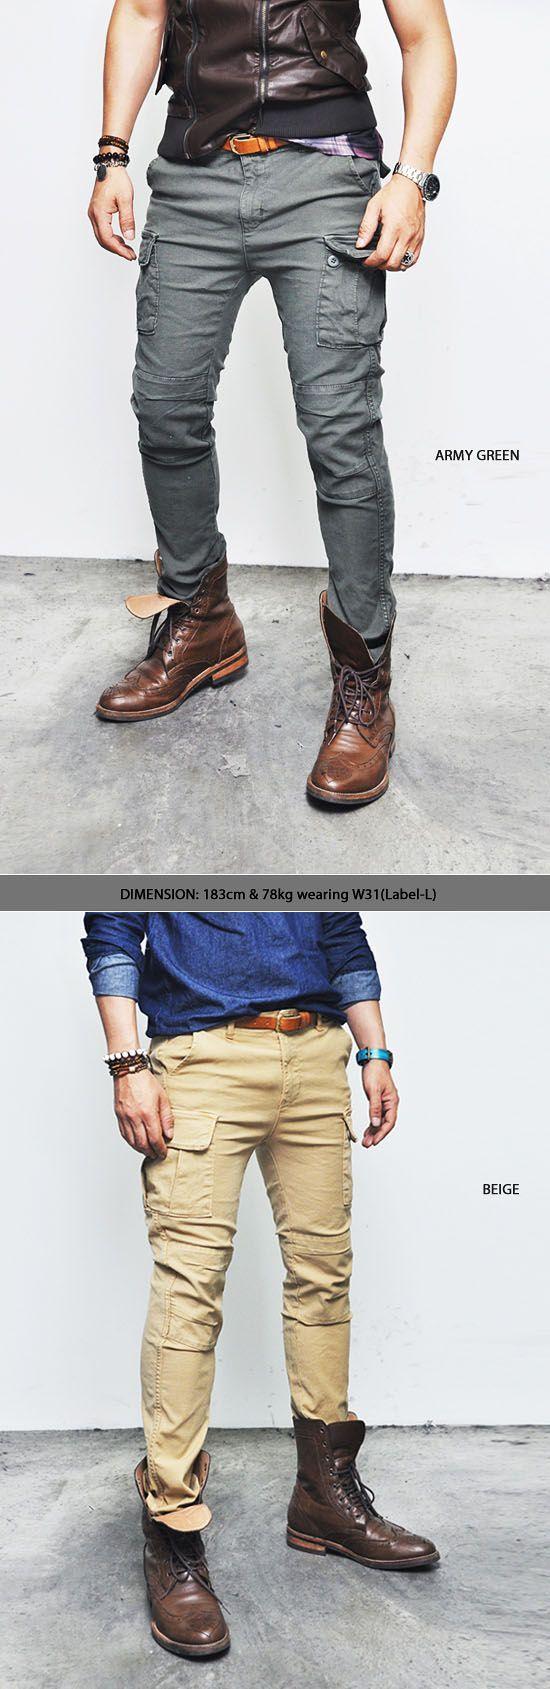 .:Casual Male Fashion Blog:.(retrodrive.tumblr.com)current trends   style   ideas   inspiration   non-flamboyant